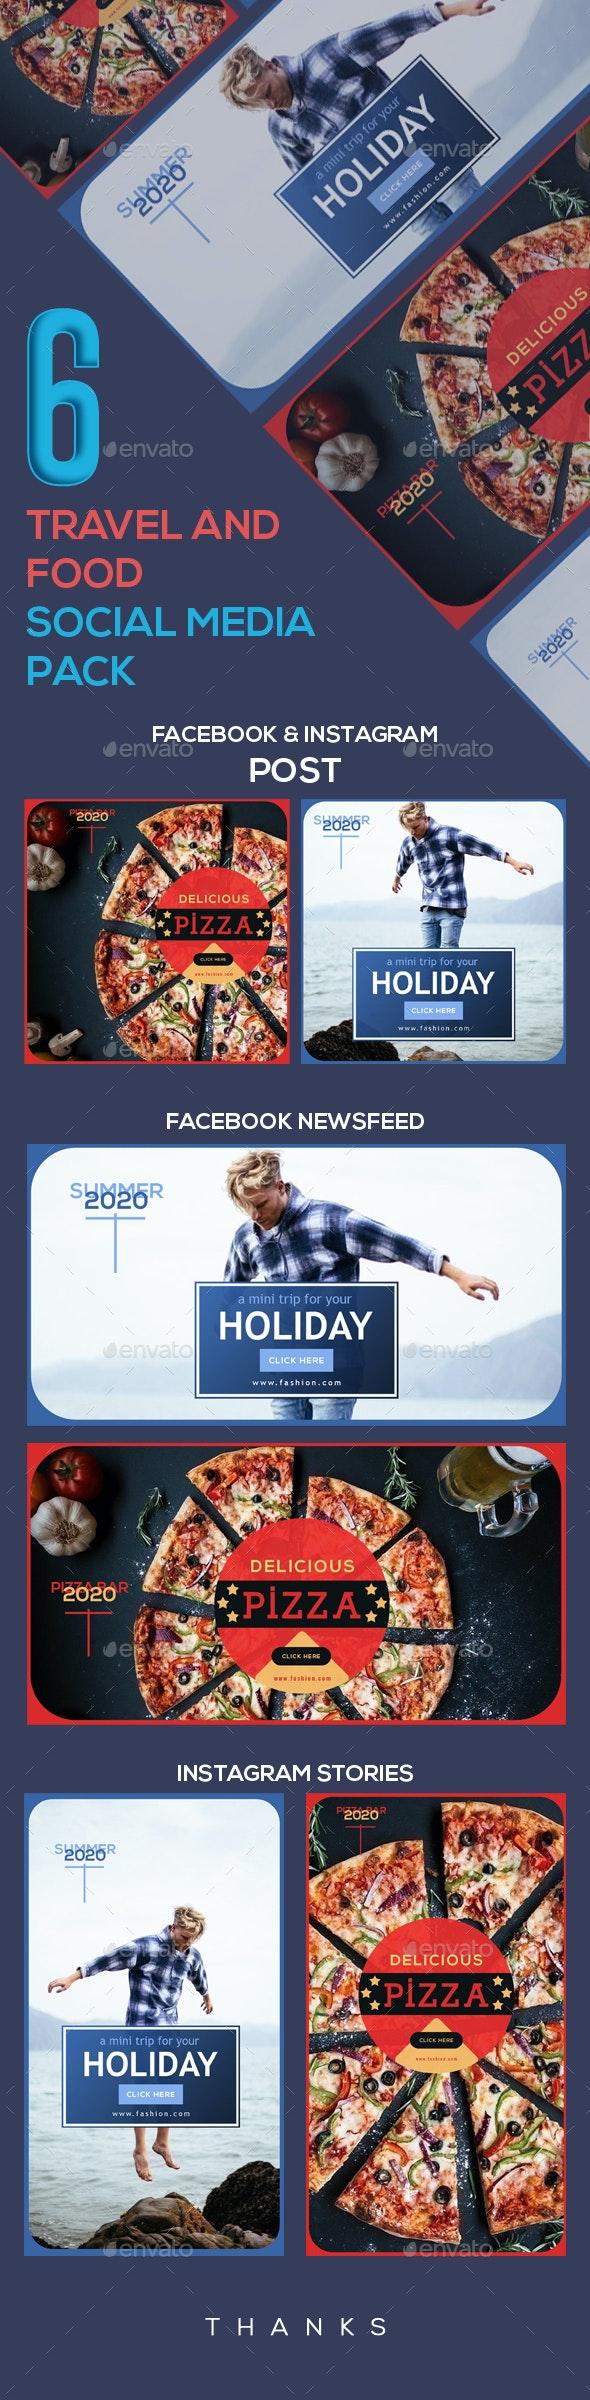 Travel And Food Social Media Pack - Social Media Web Elements